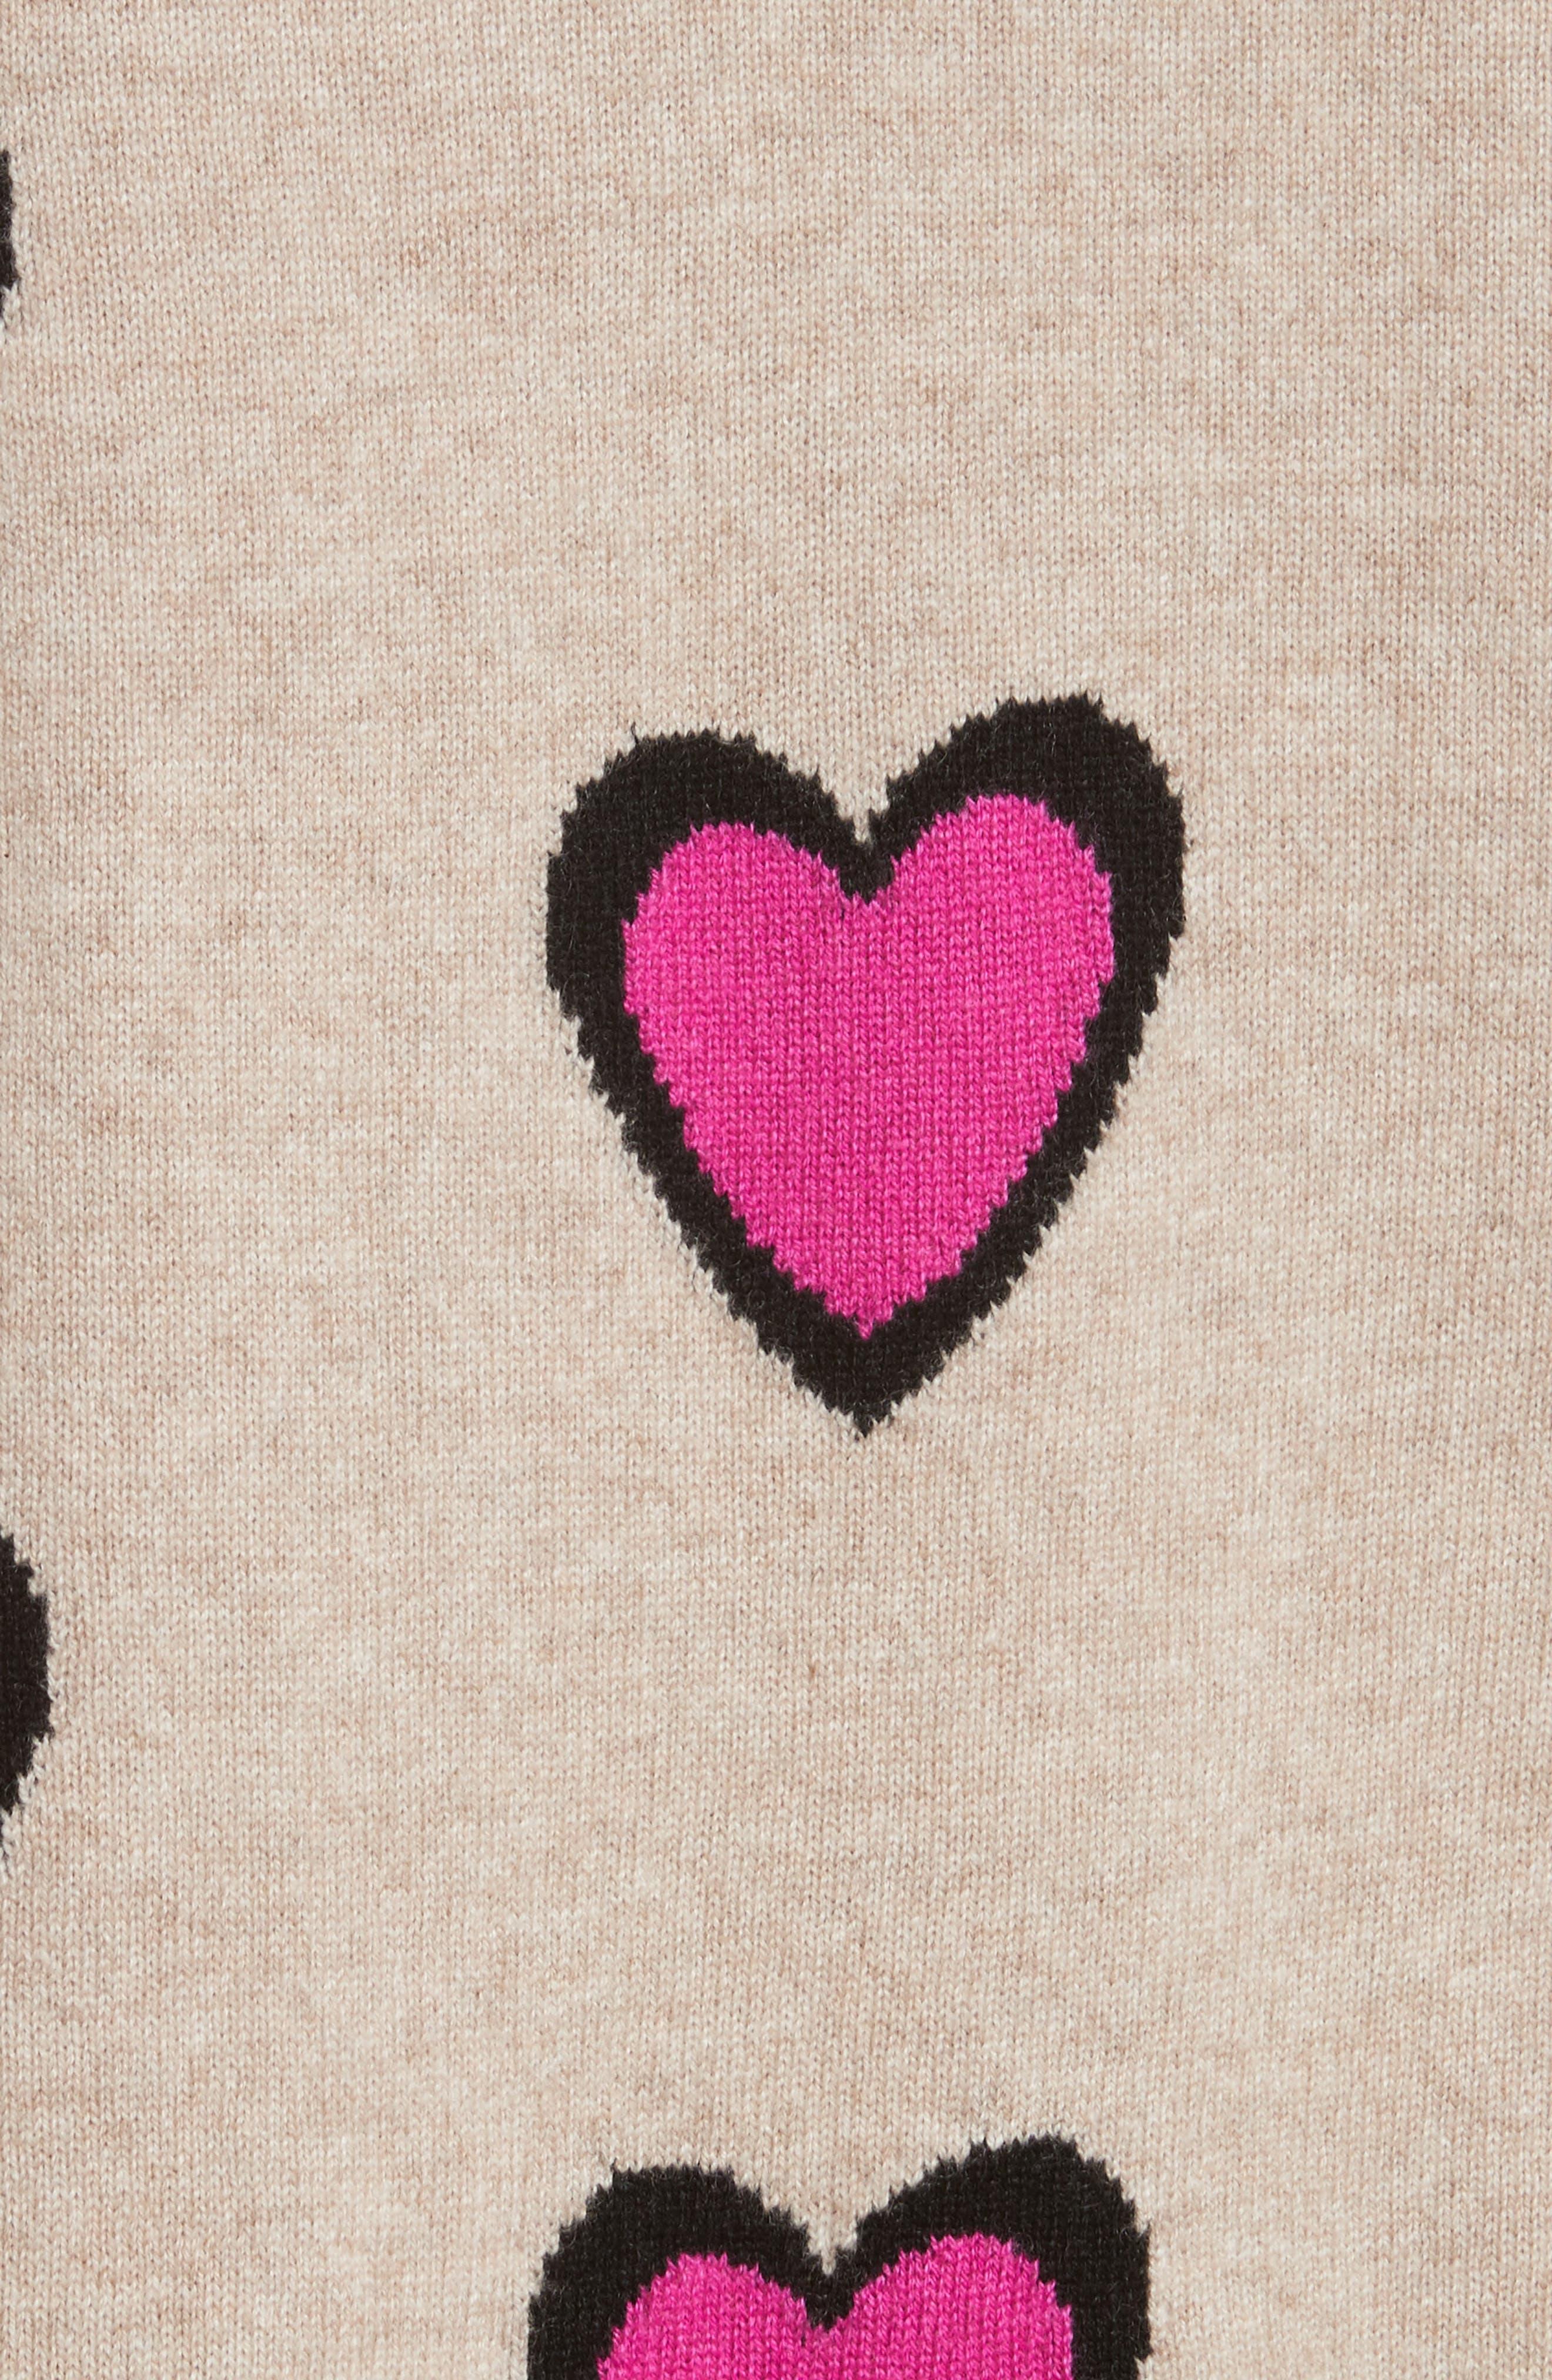 CHINTI & PARKER Heart Burst Cashmere Sweater,                             Alternate thumbnail 5, color,                             Oatmeal/ Black/ Fuchsia